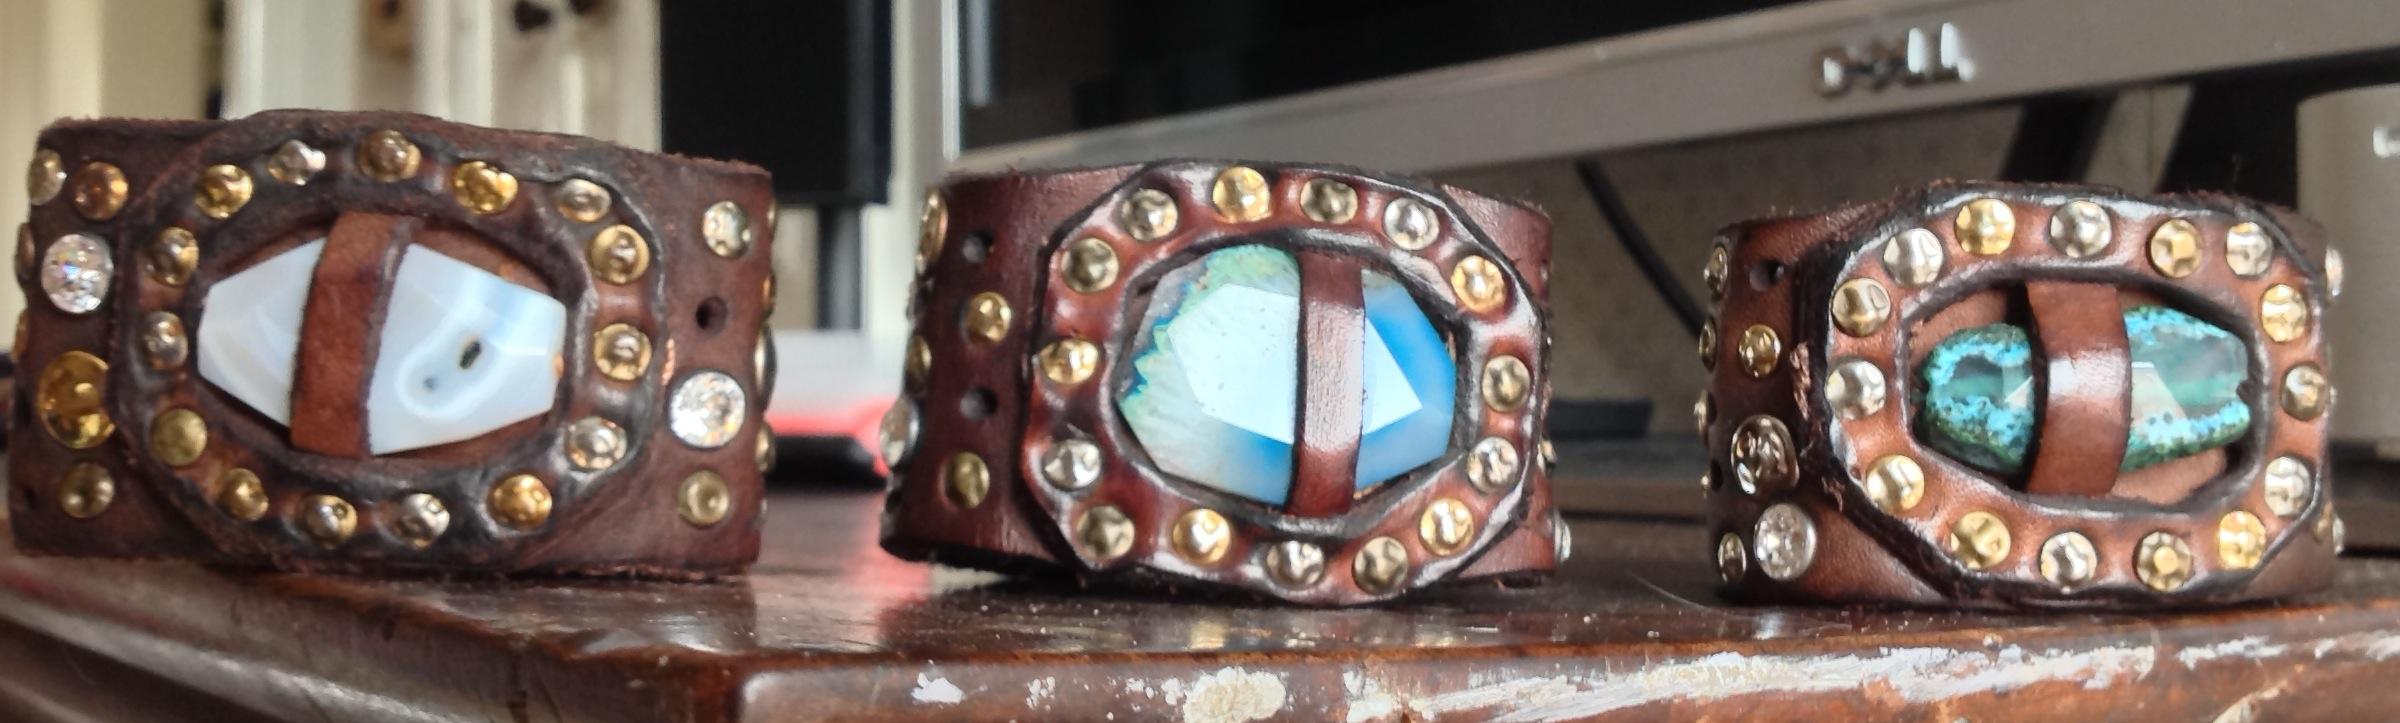 5832157de27a ... 5-1photo  2GAETANO-Campomaggi-bracelet-with-white-rock-1GAETANO-Campomaggi-Bracelet-VLE-P8GAETANO-Wide-Studded- Leather-Bracelet-Blue-4-320